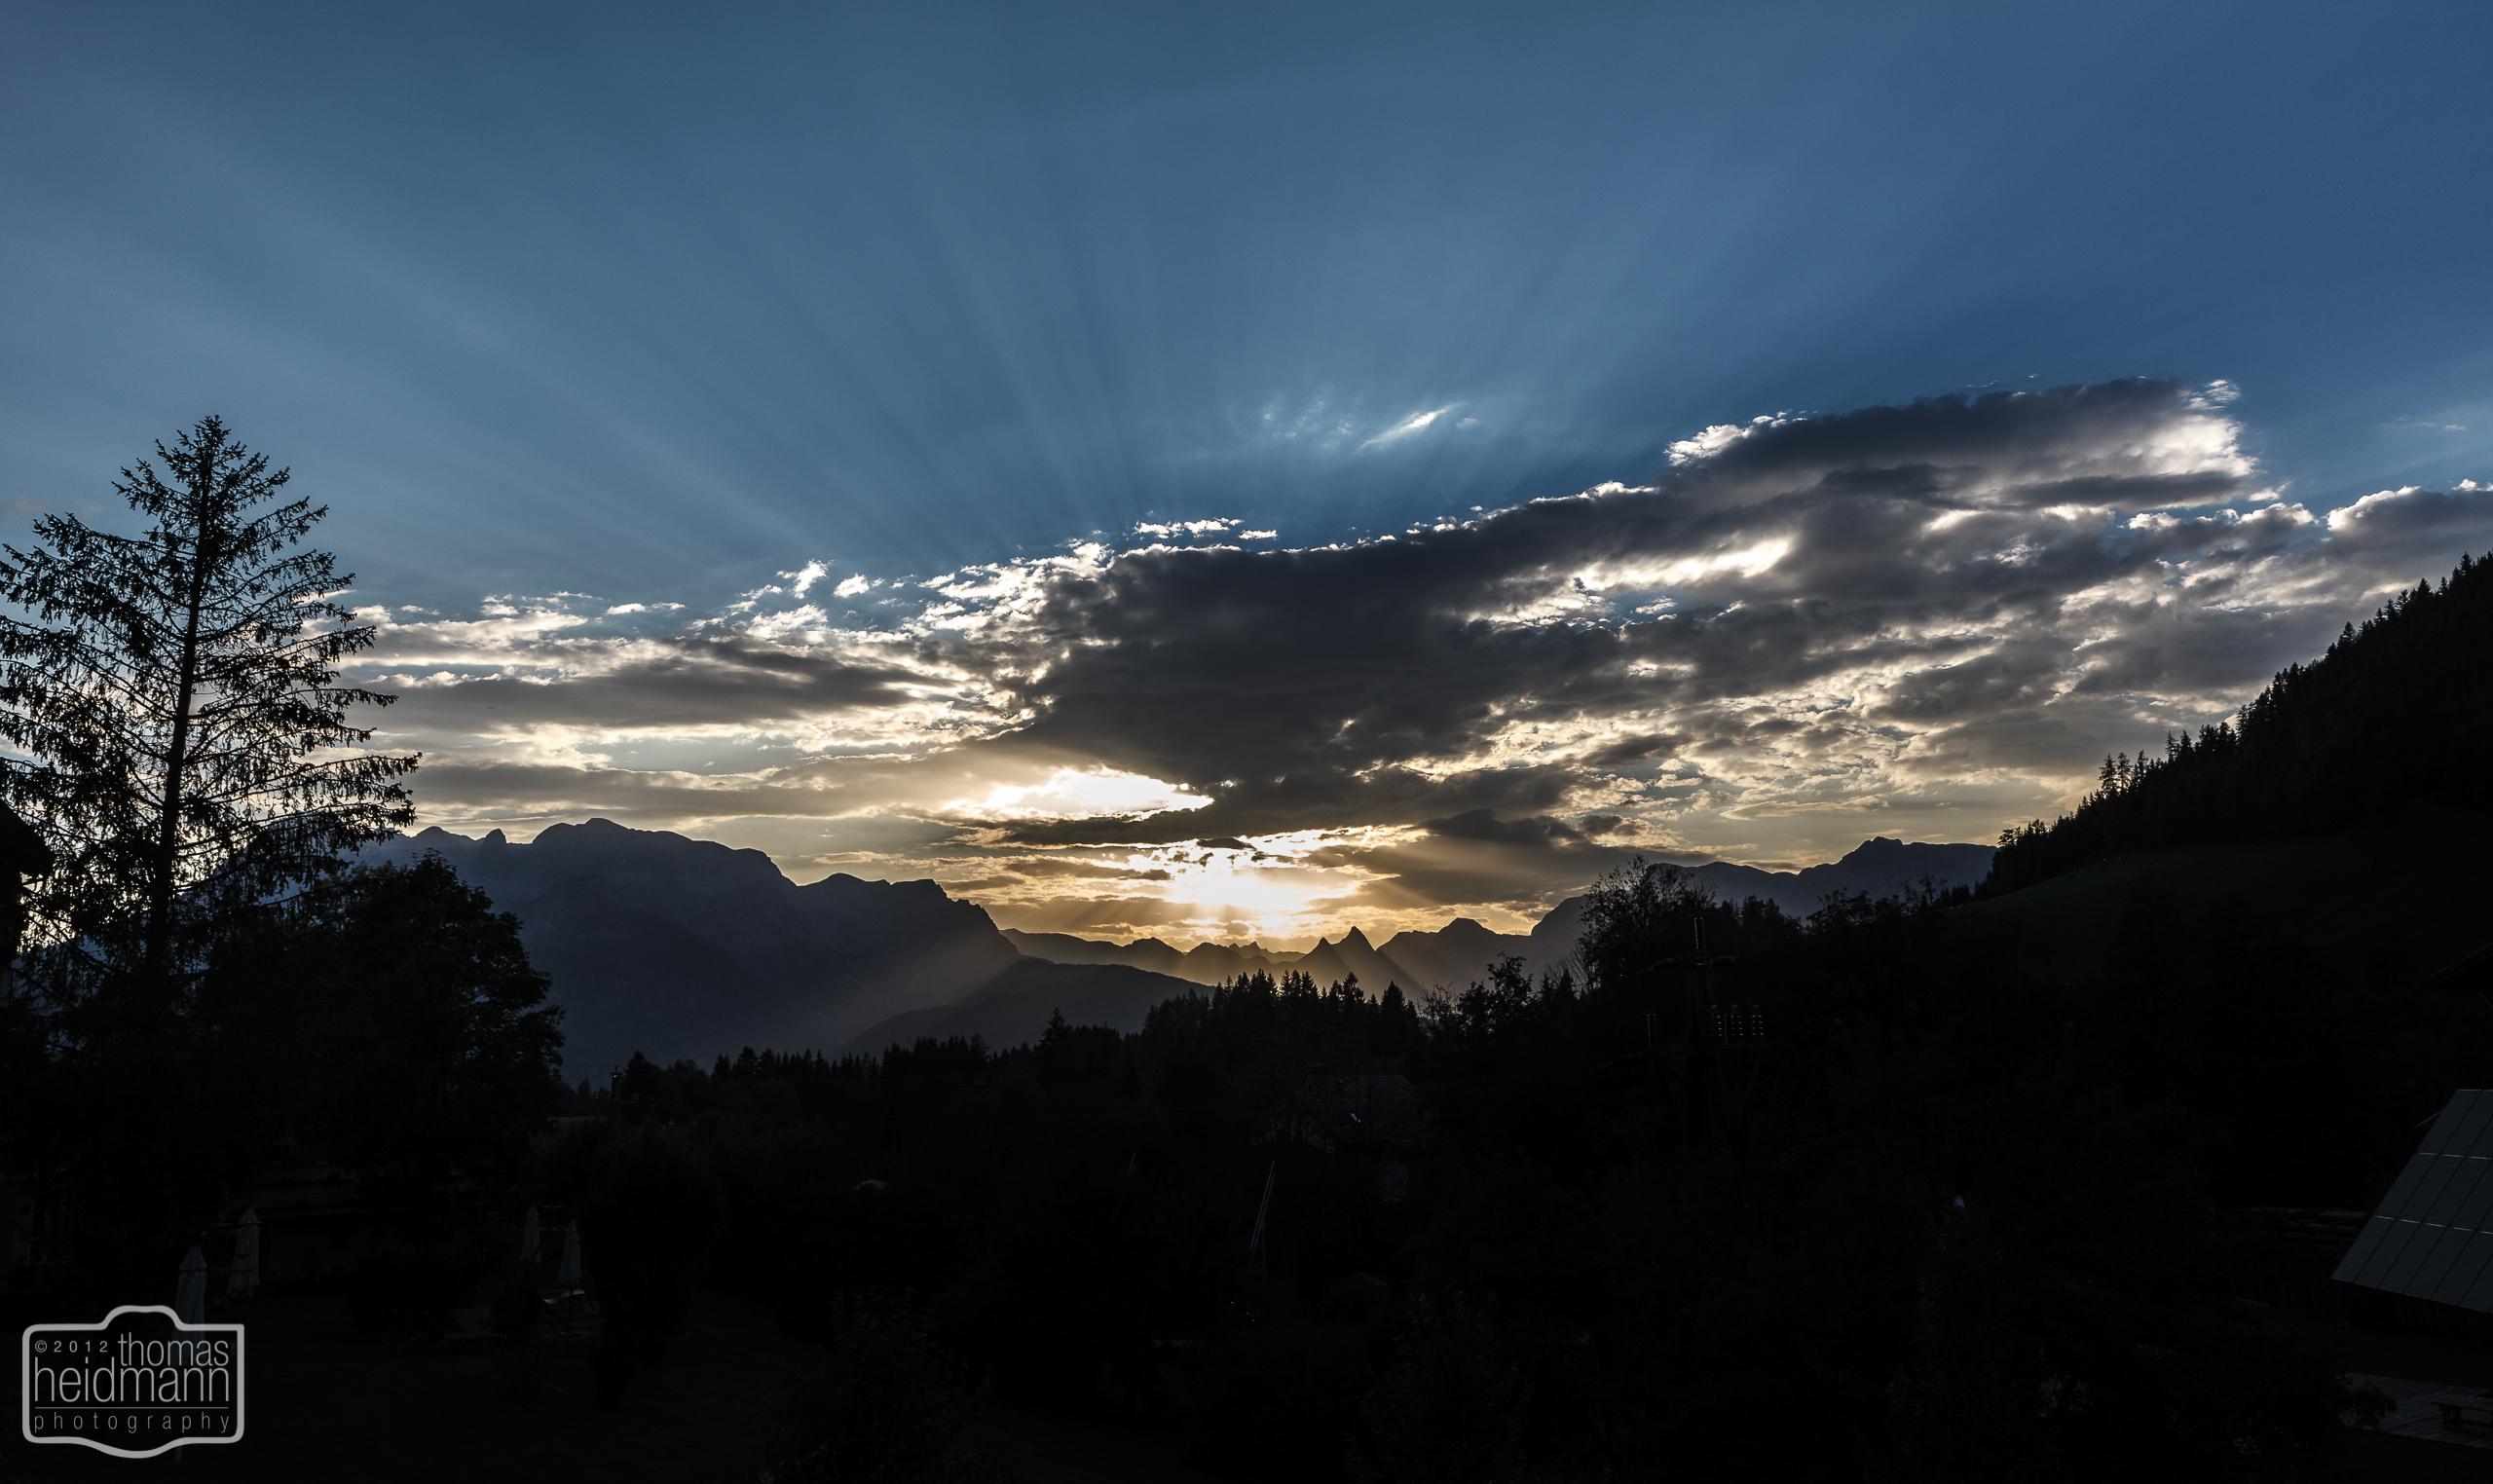 Sonnenuntergang in Werfenweng